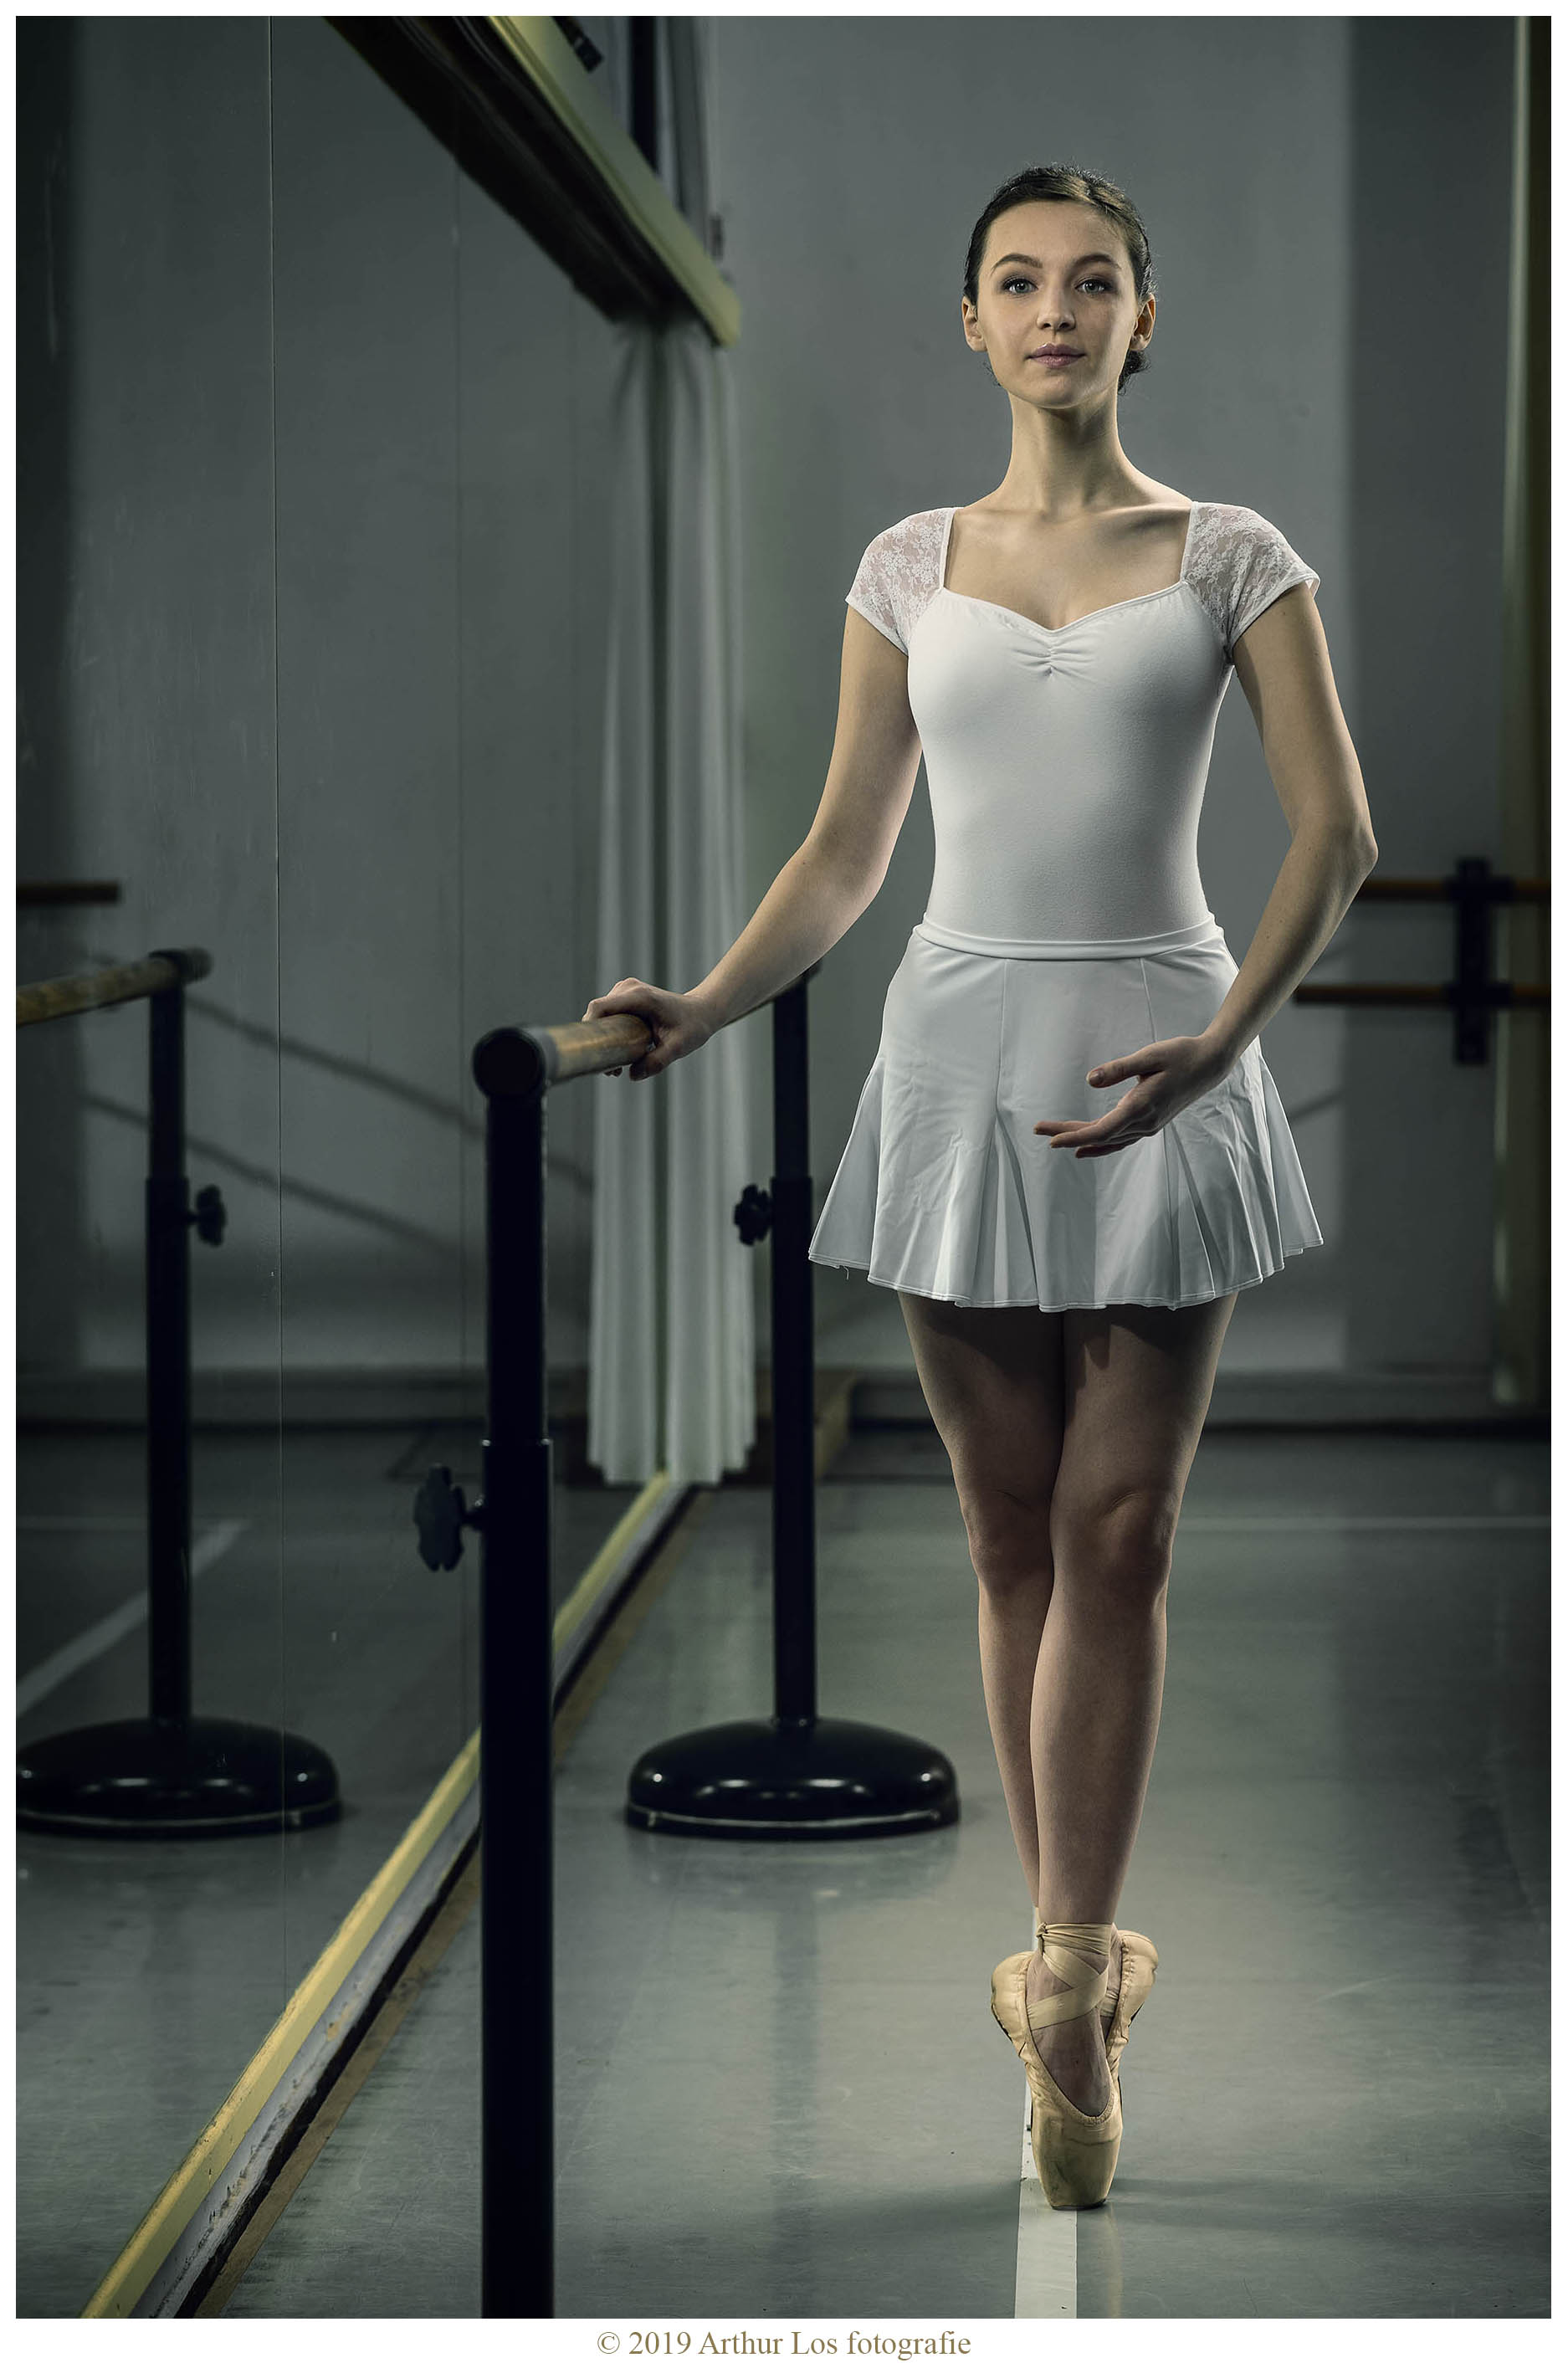 Arthur Los Fotografie - Stedelijk Conservatorium Mechelen Dans